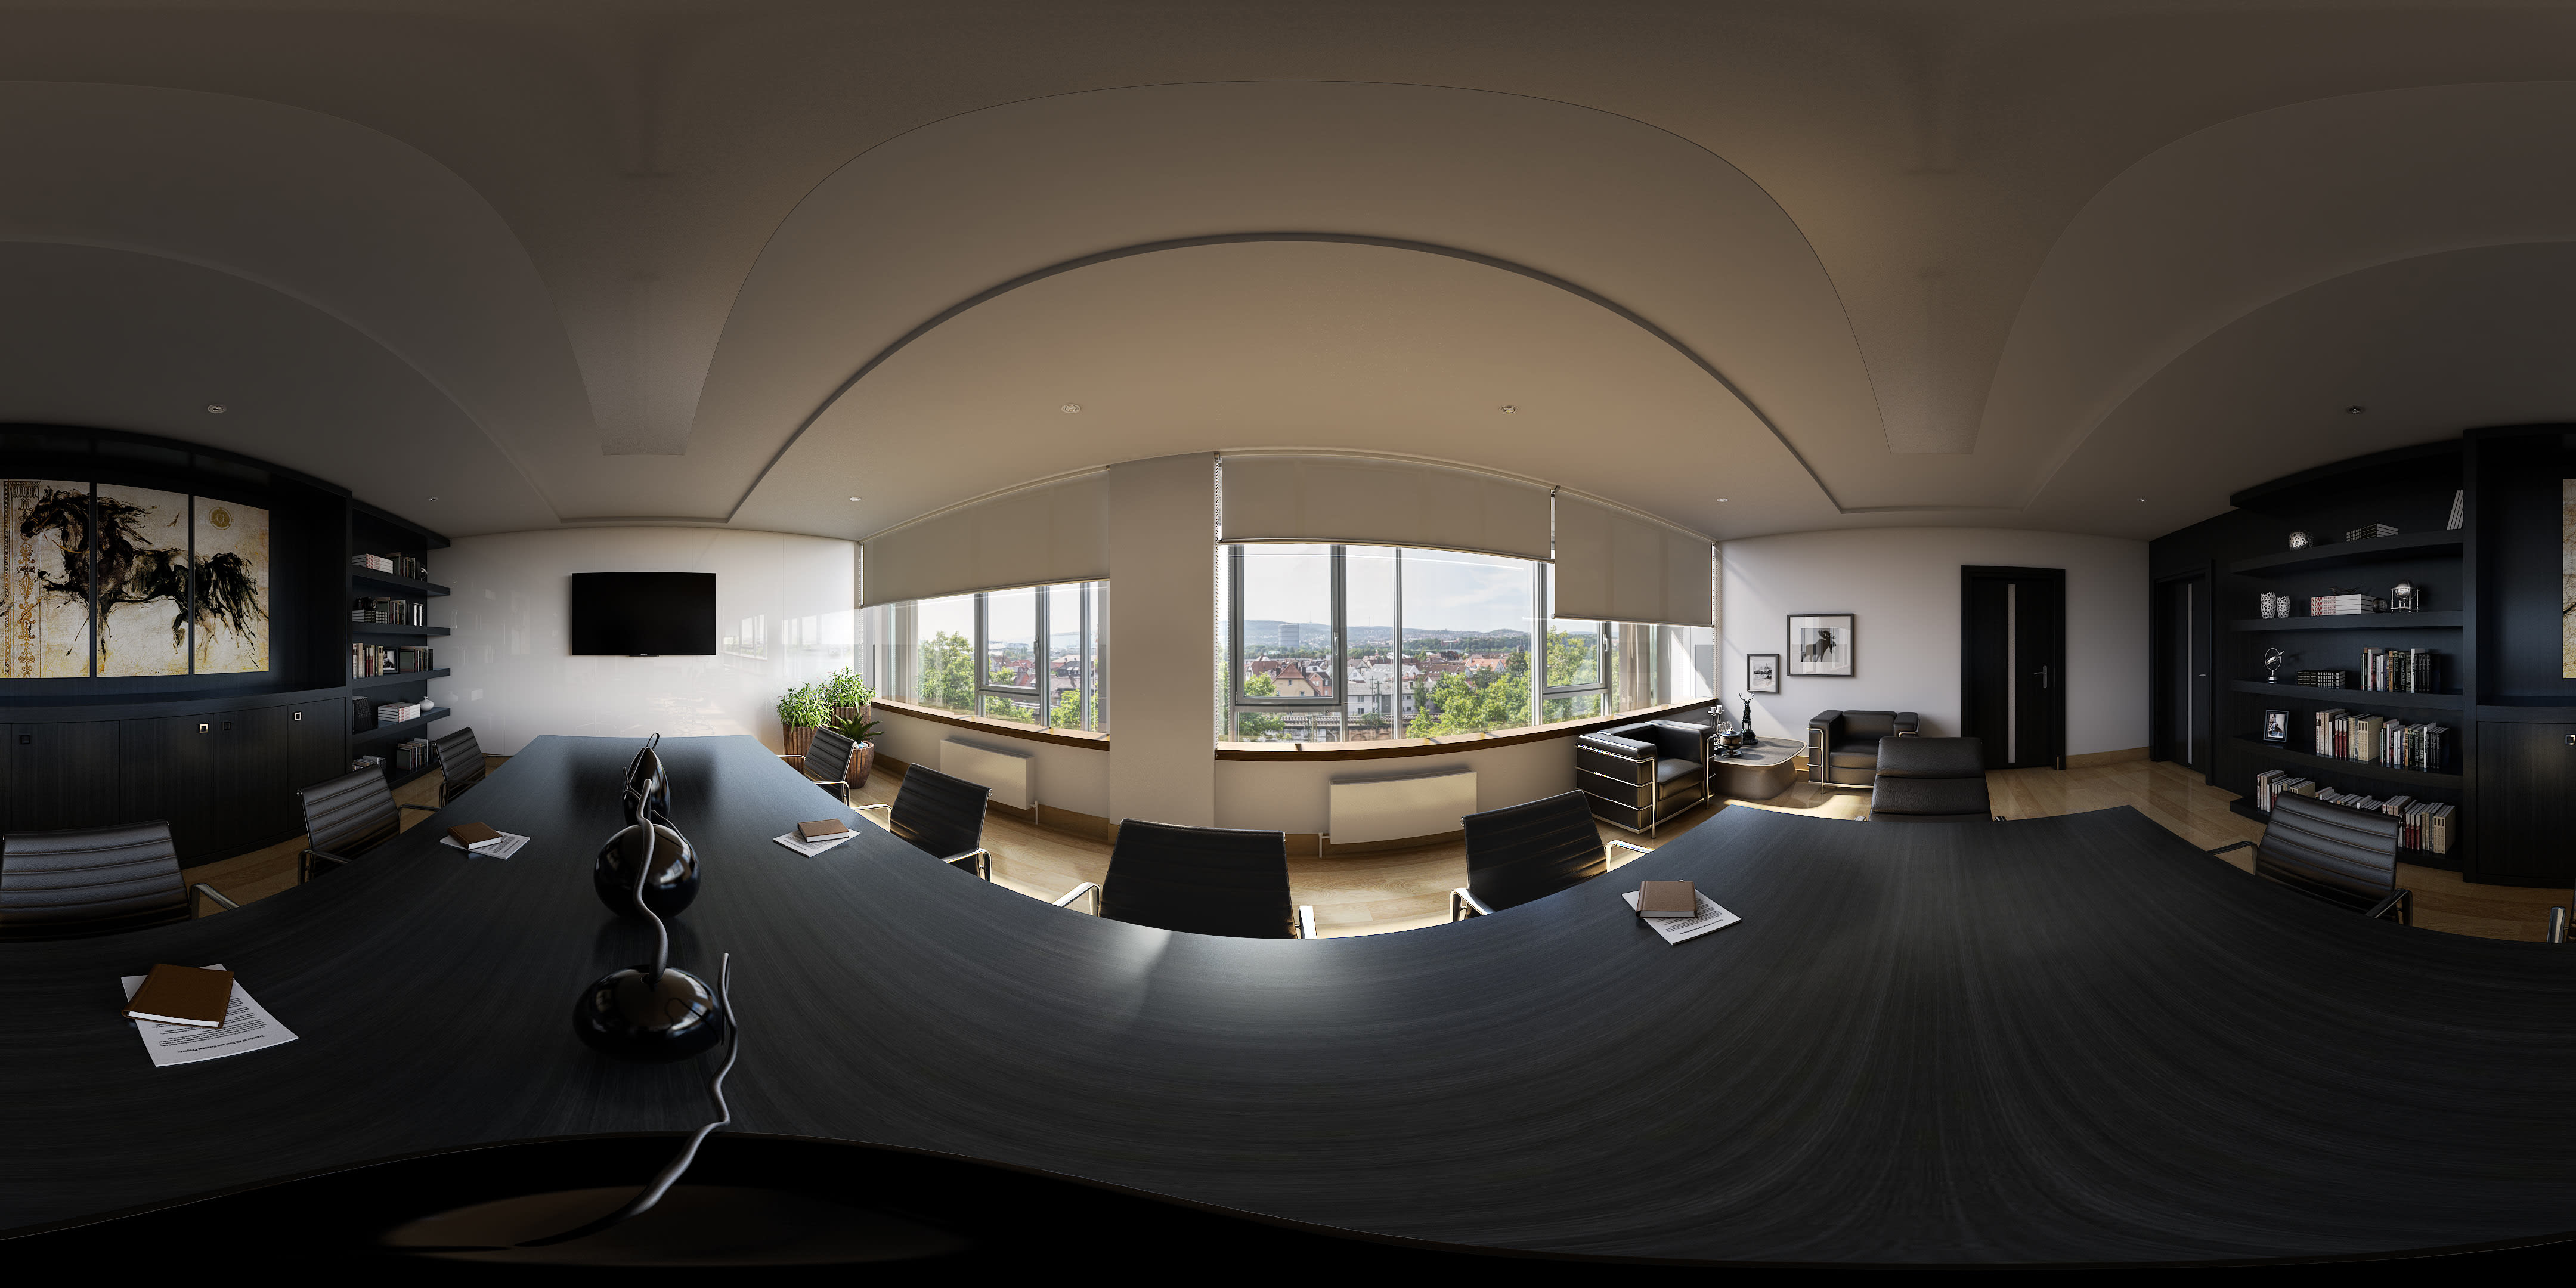 Immobilienvermarktung 360 Grad Rundgang spheroVision